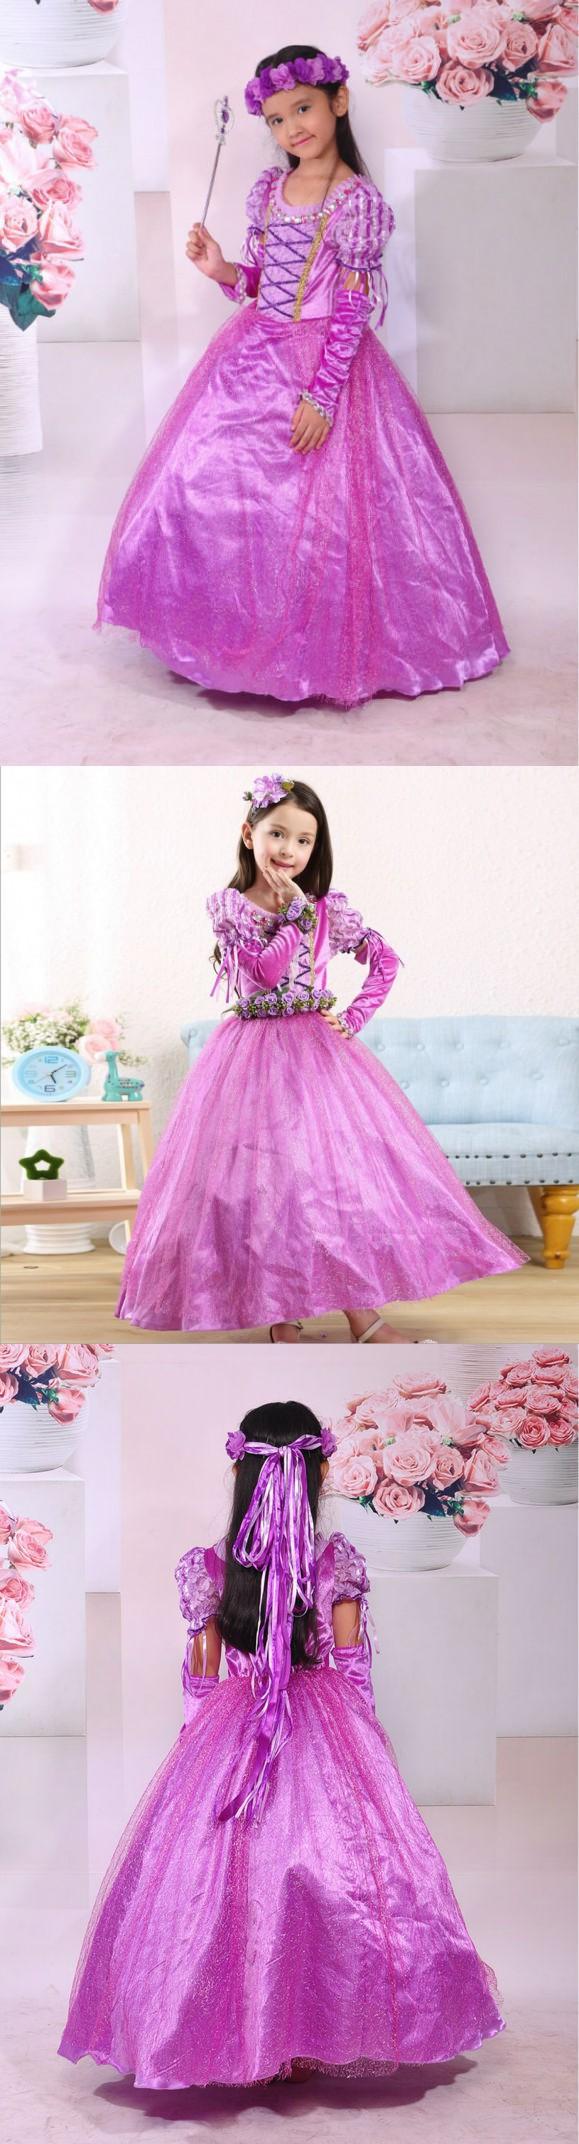 Rapunzel Princess girl dress Kids Girls Party Dress Halloween Xmas ...